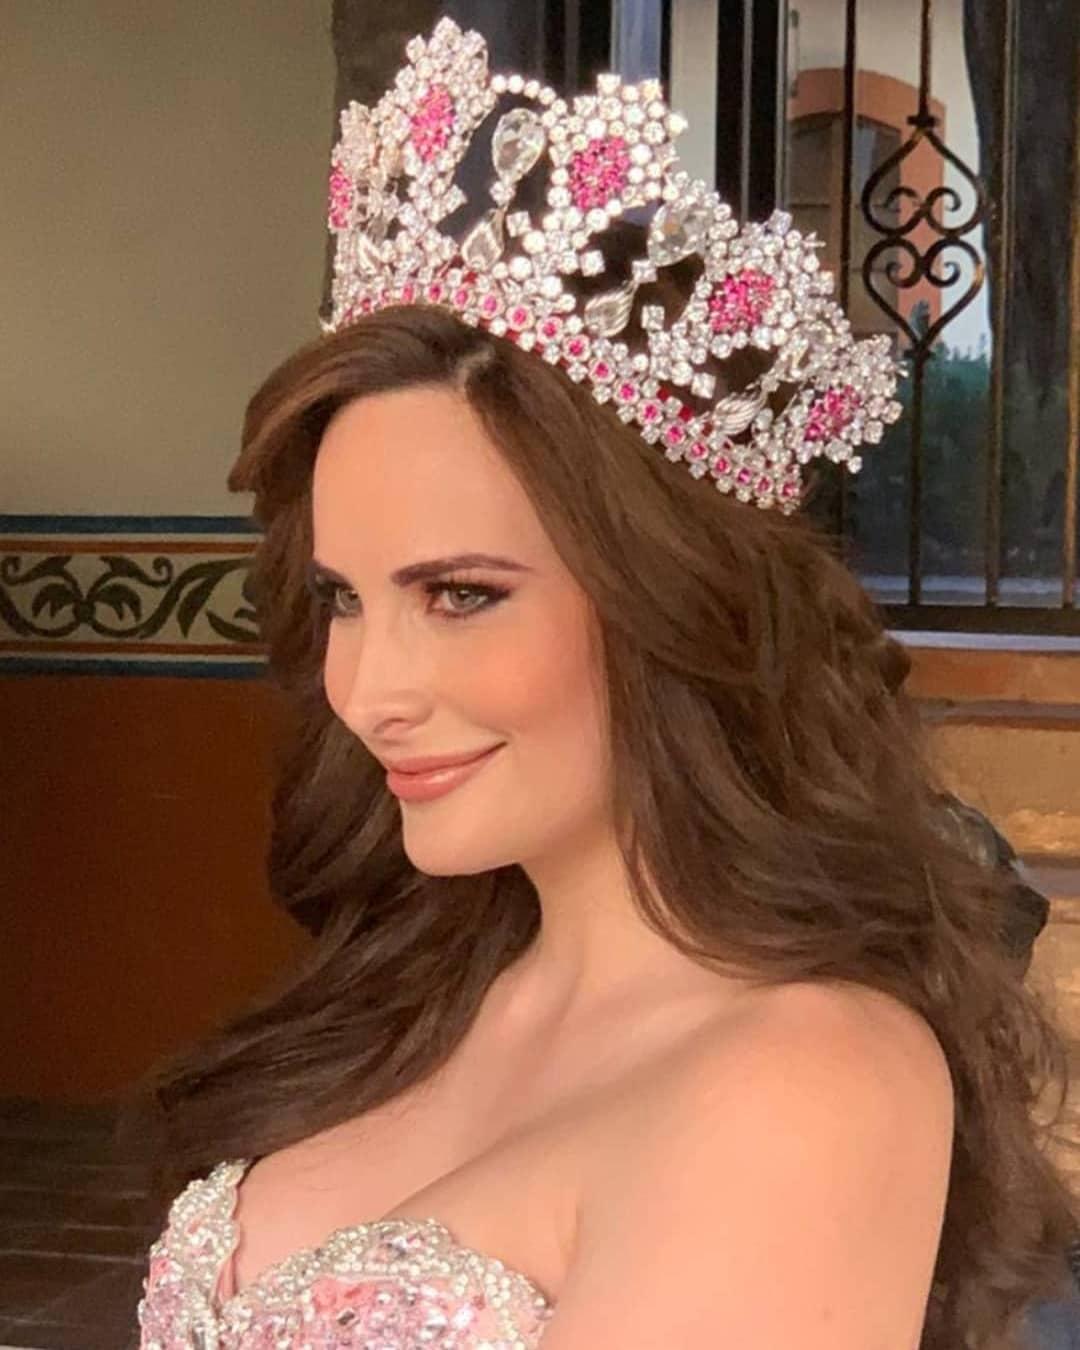 new corona de mexicana universal. Missosologymx-127225707-897114850826550-6785626377471027320-n